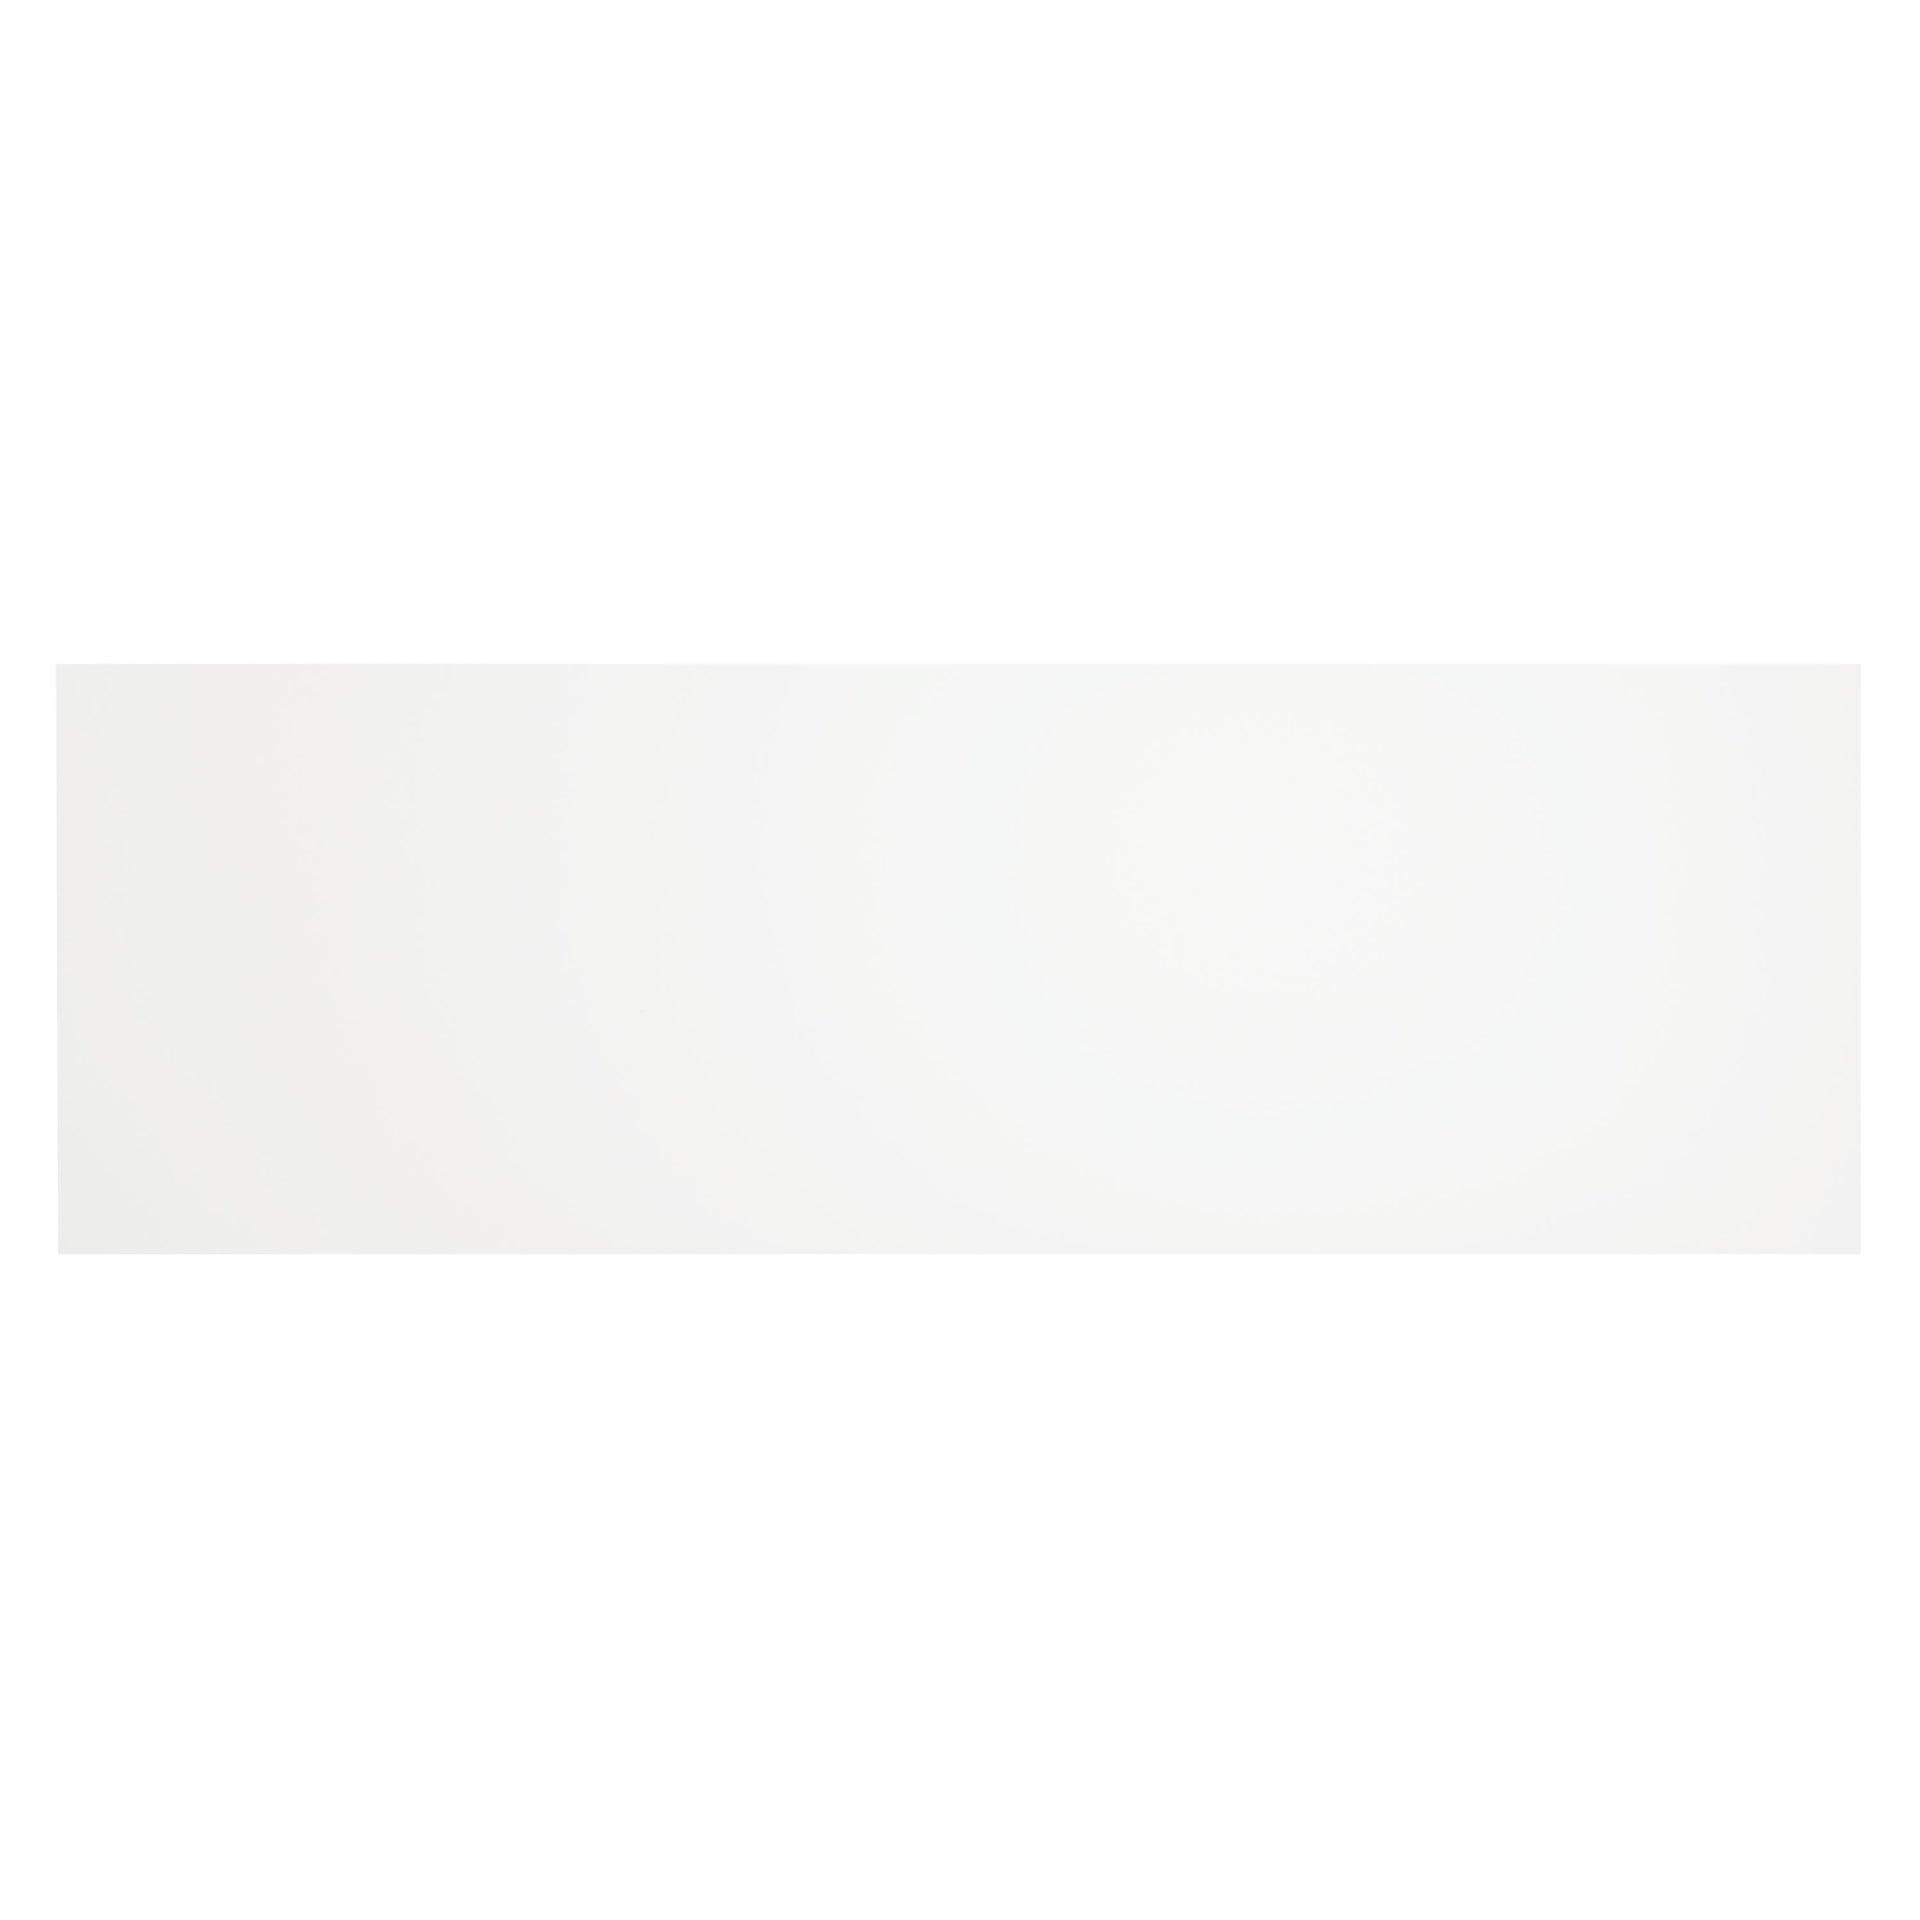 Piastrella per rivestimenti Arctic 30 x 90 cm sp. 10 mm bianco - 3